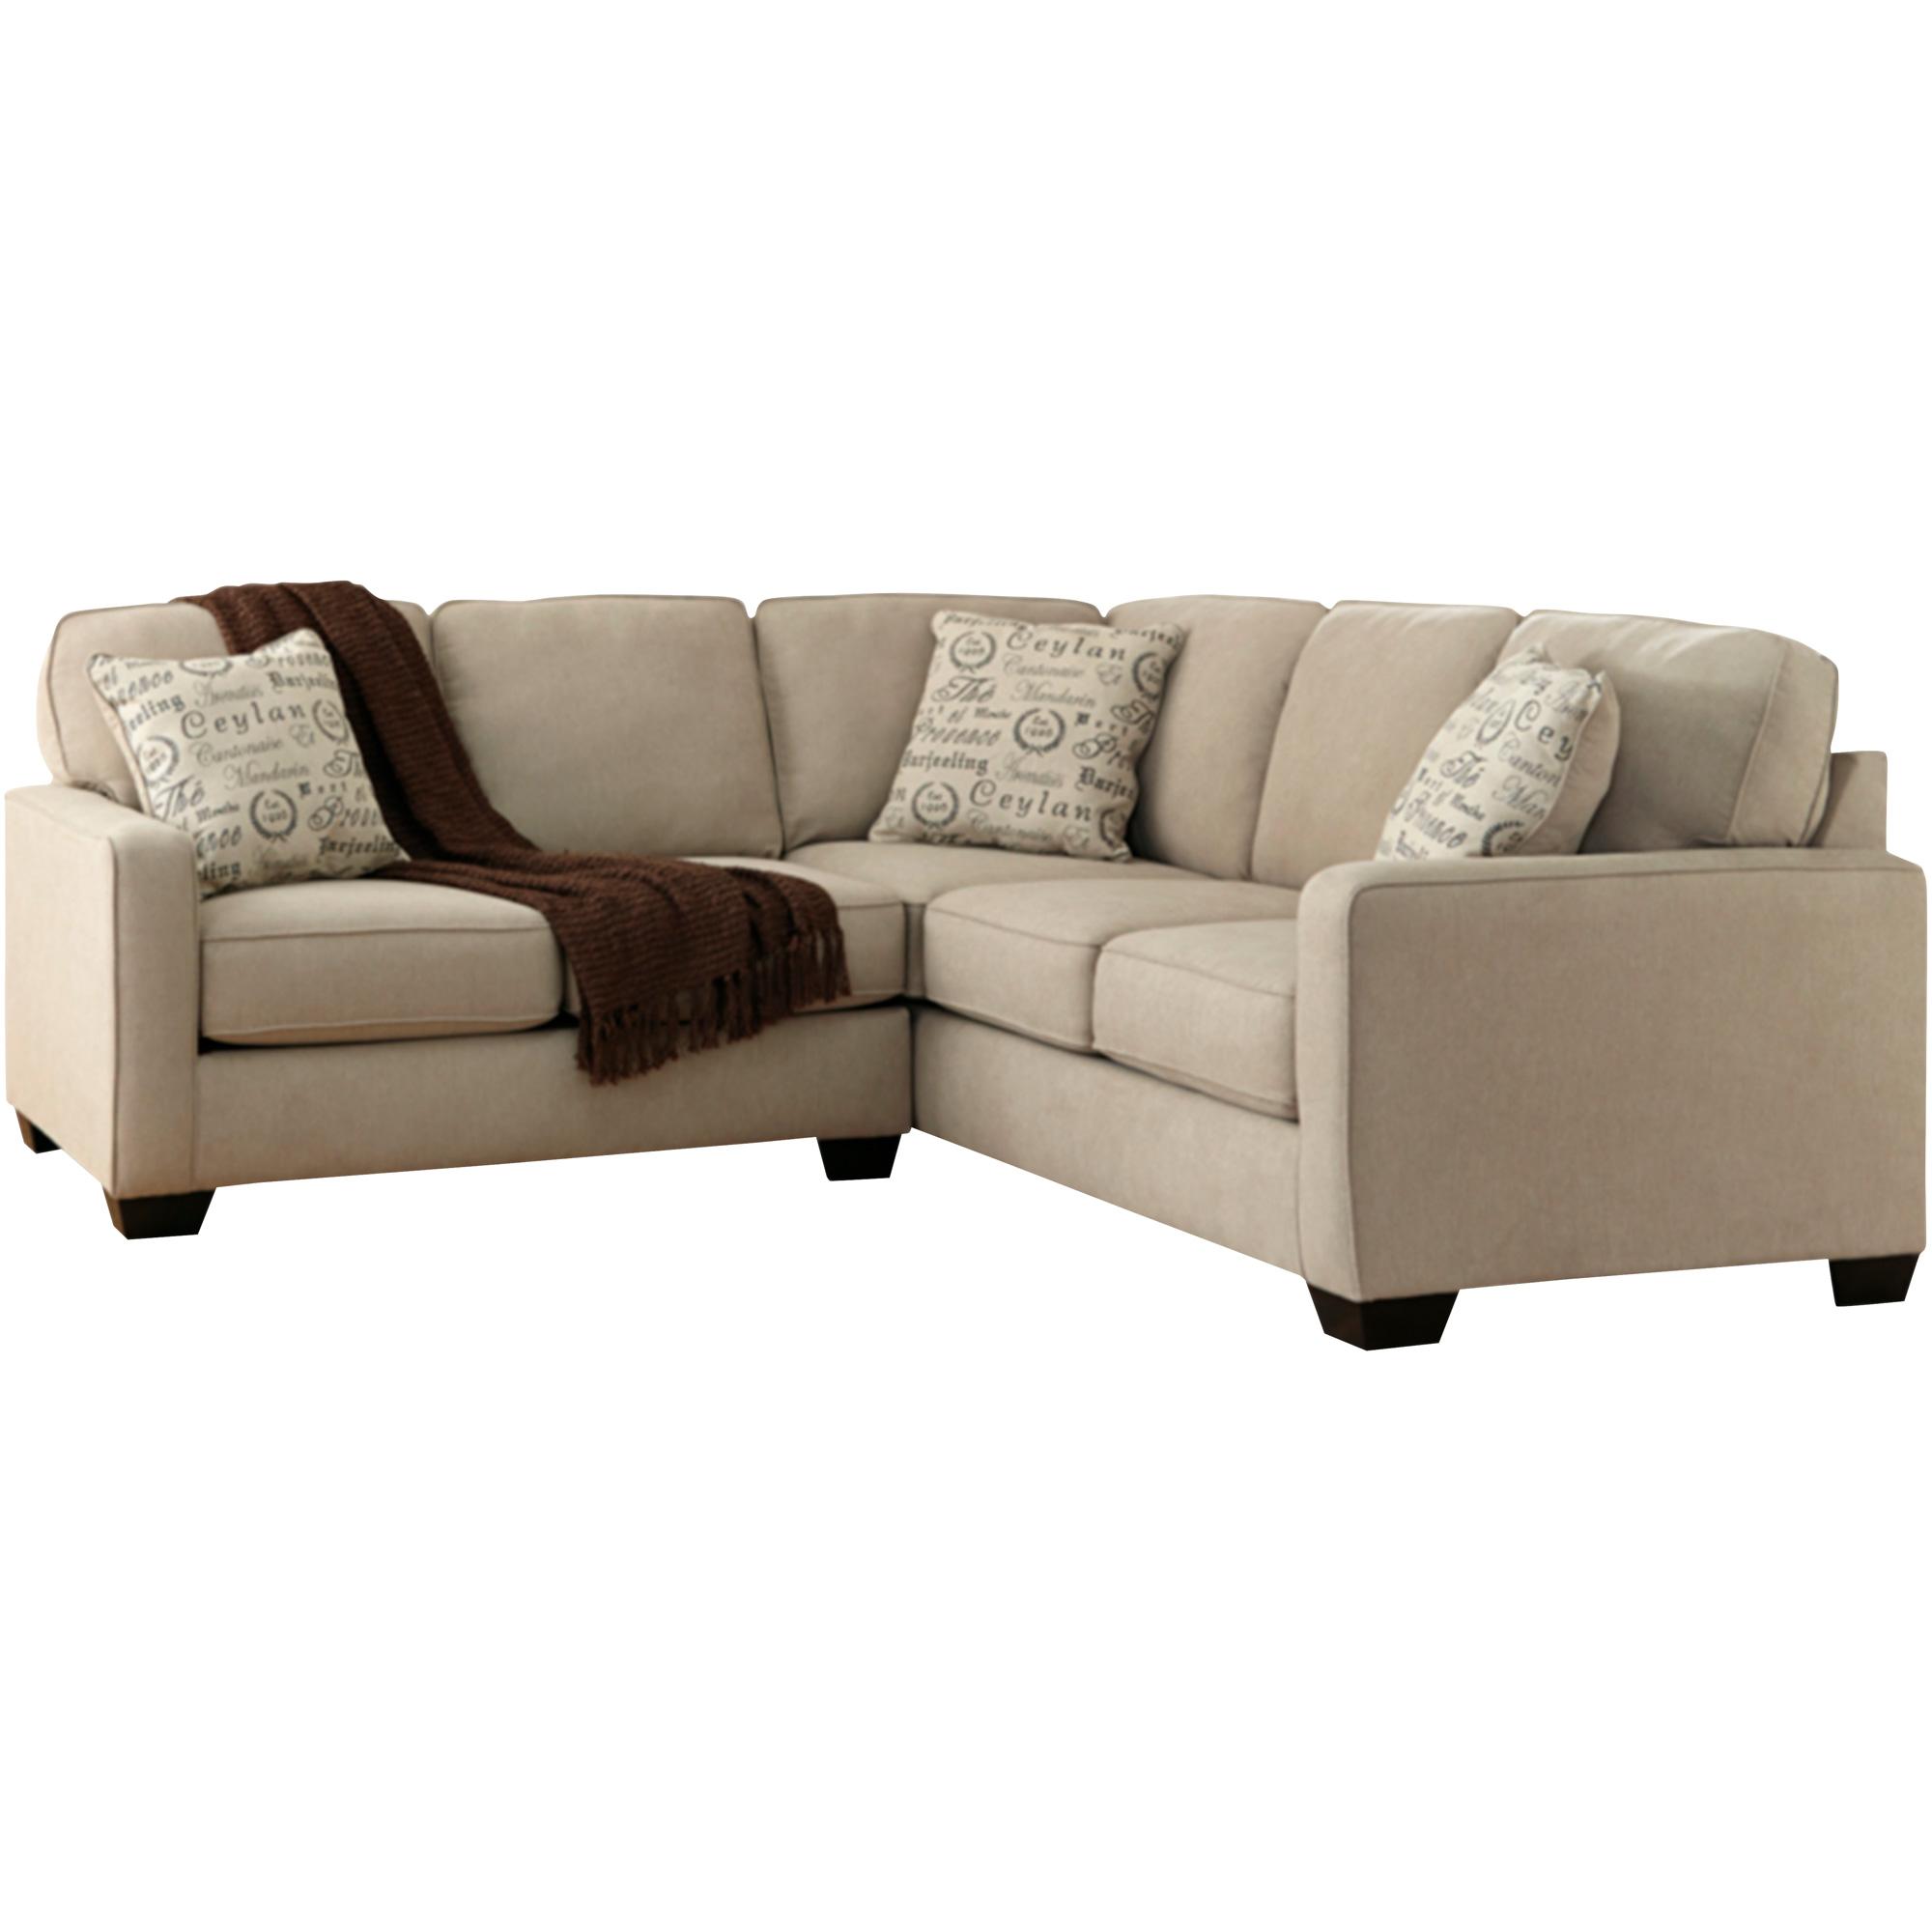 Ashley Furniture | Alenya Quartz 2 Piece Left Sectional Sofa